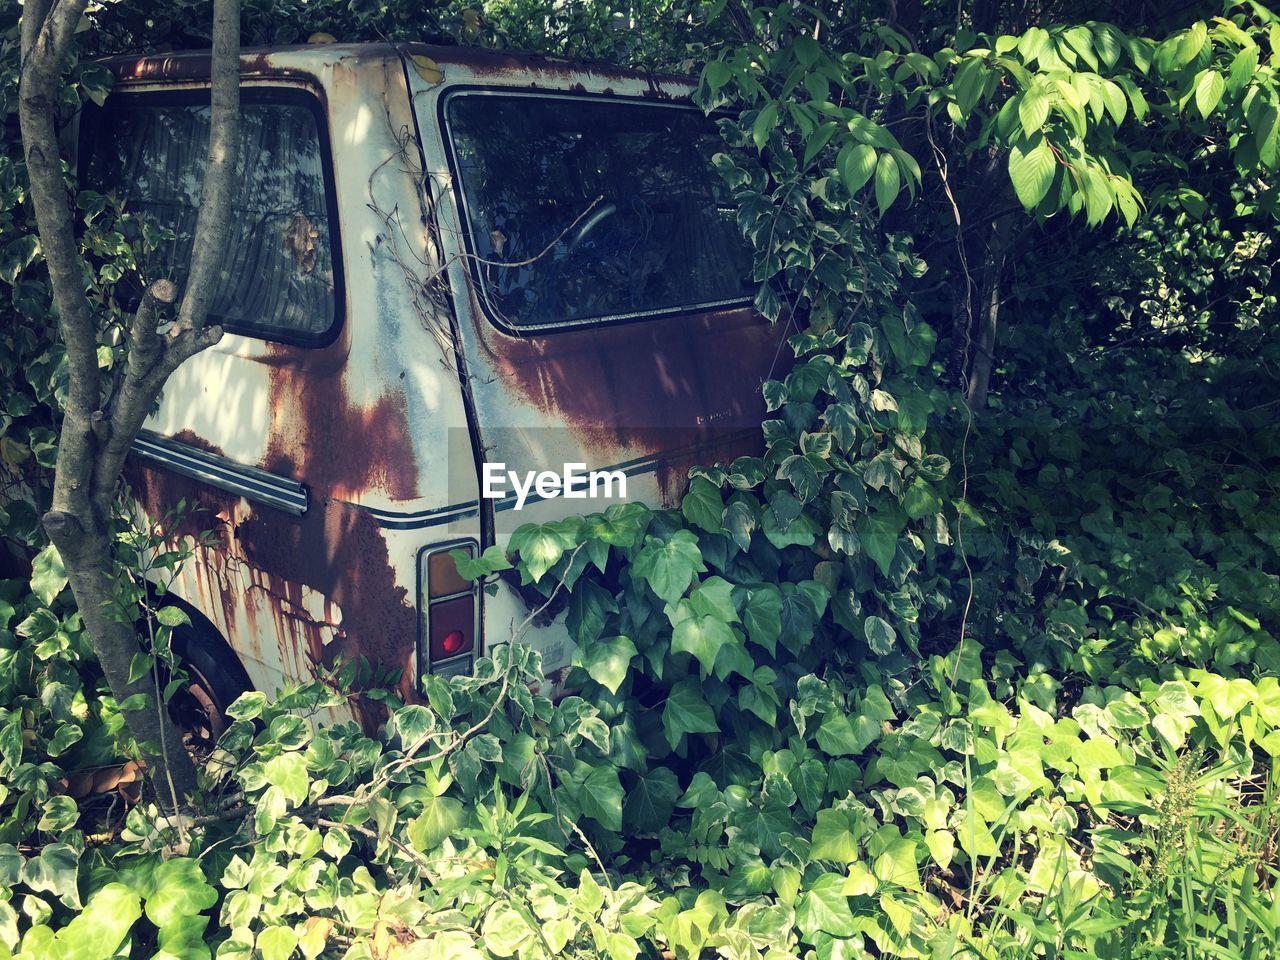 Abandoned vehicle amid plants